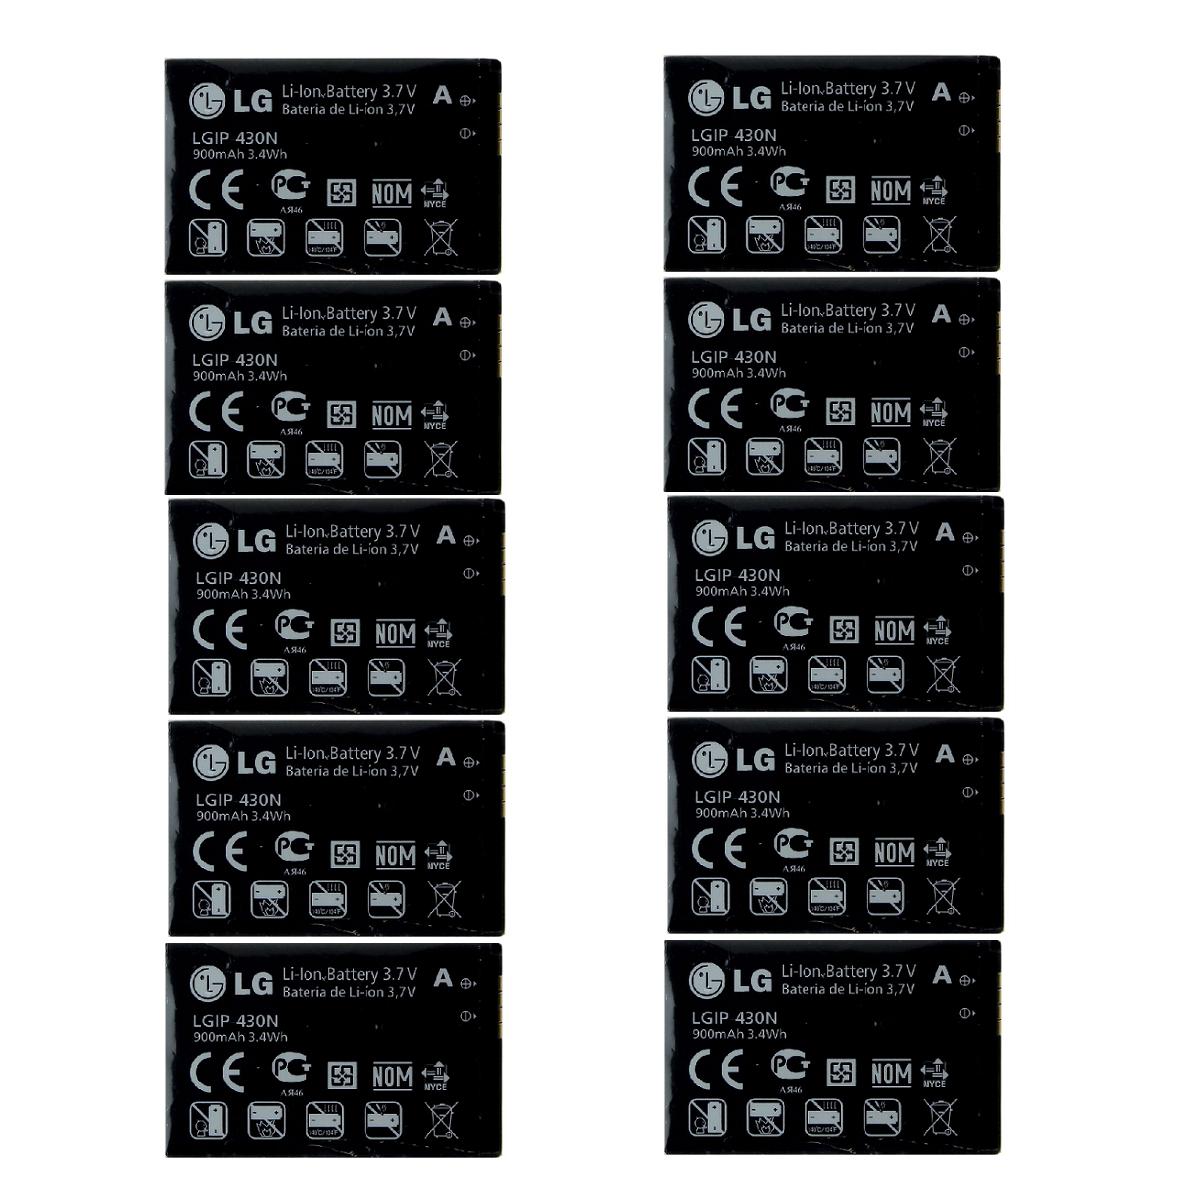 KIT 10x LG LGIP-430N 900 mAh Replacement Battery for LG LX290